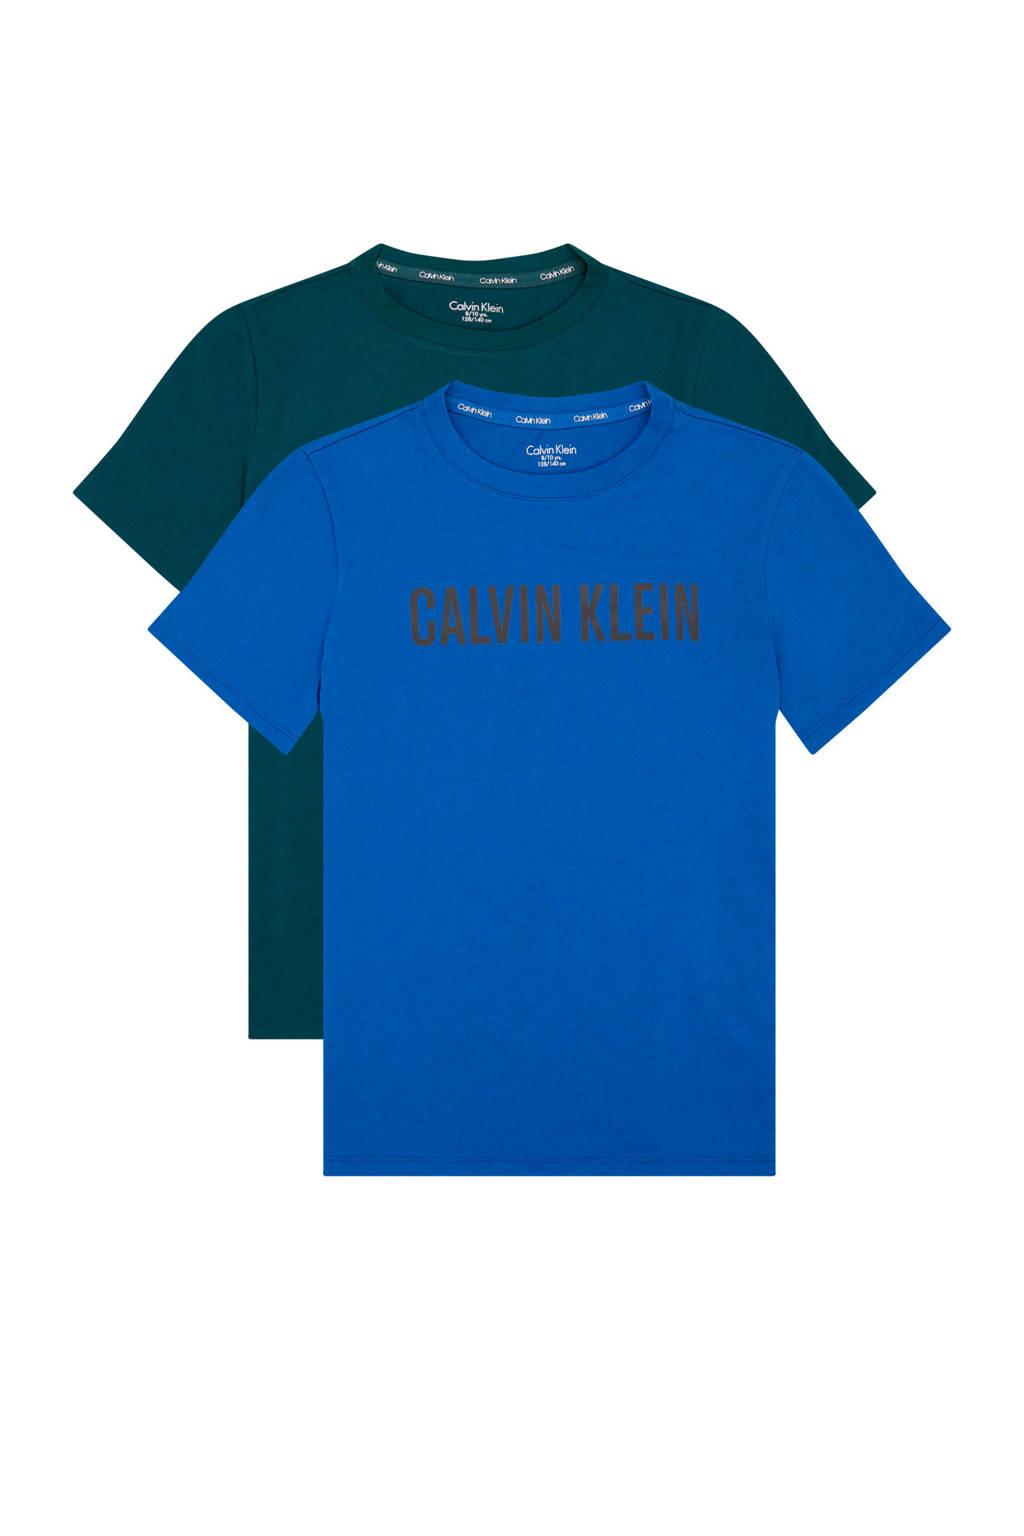 CALVIN KLEIN T-shirt - set van 2 blauw/donkergroen, Blauw/donkergroen